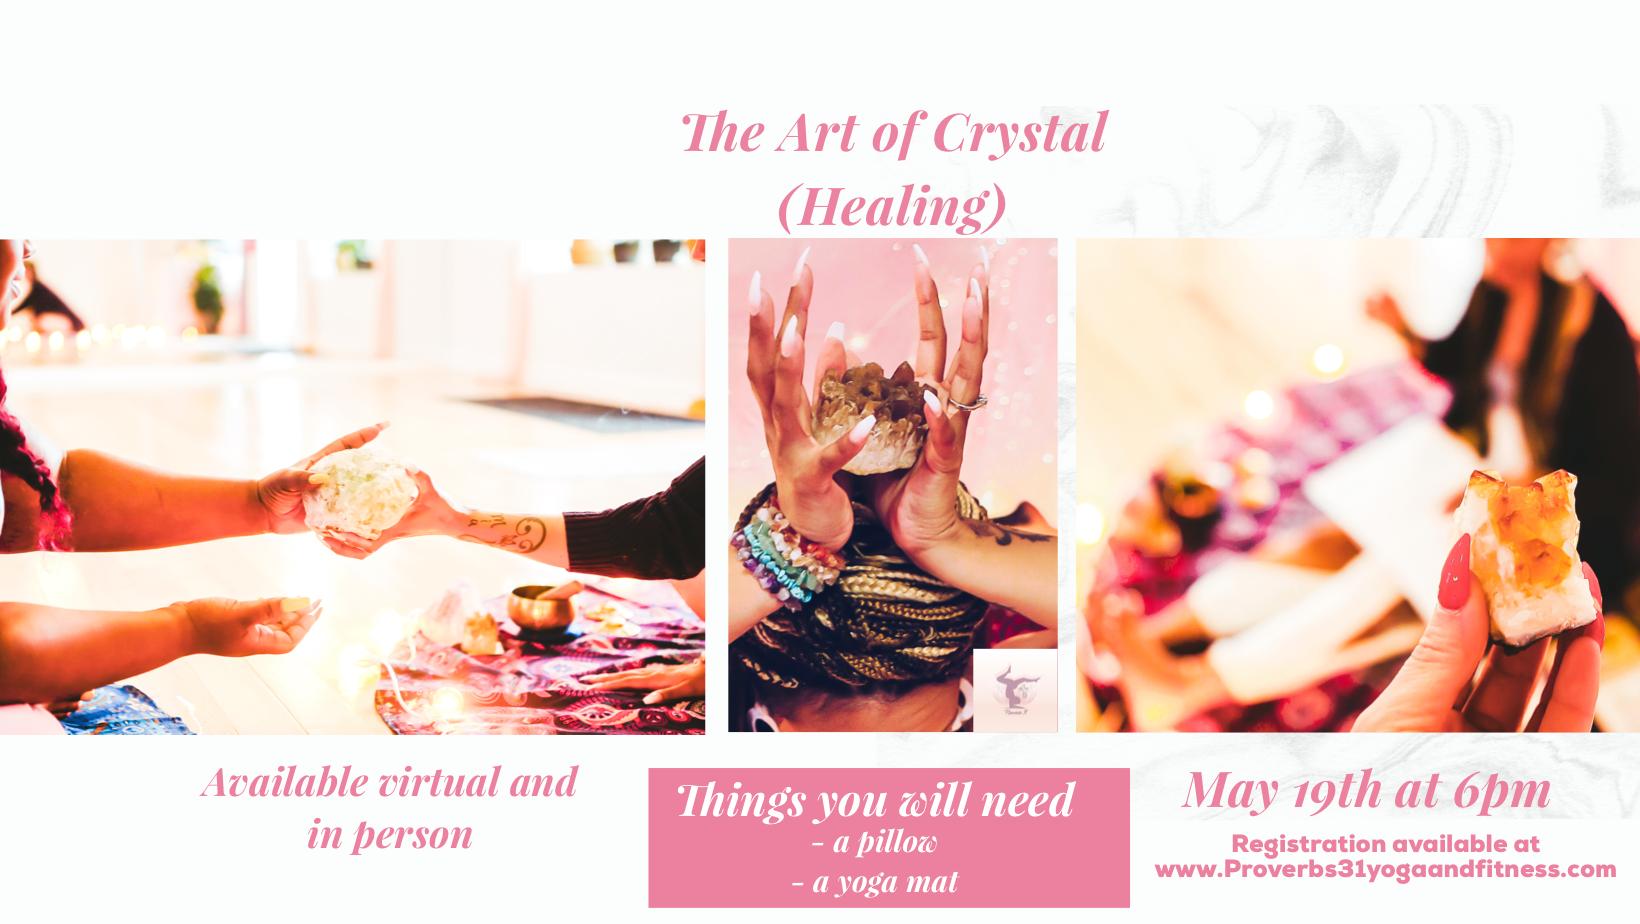 Art of Crystal Healing